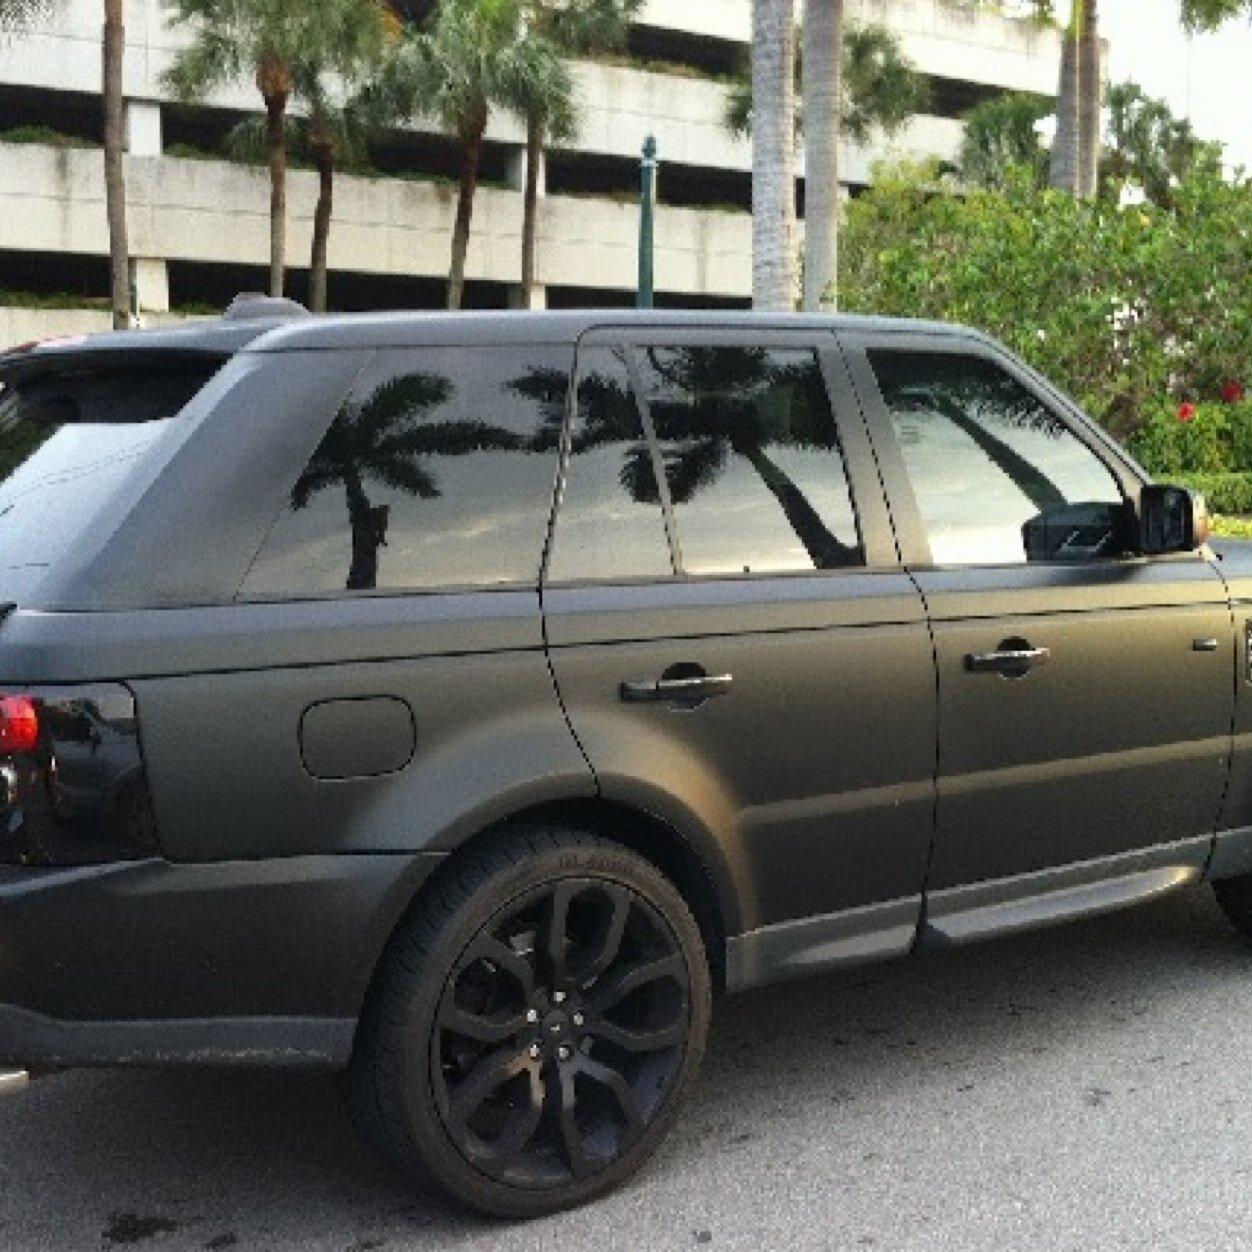 Matte Black Cars (@CarsMatteBlack)